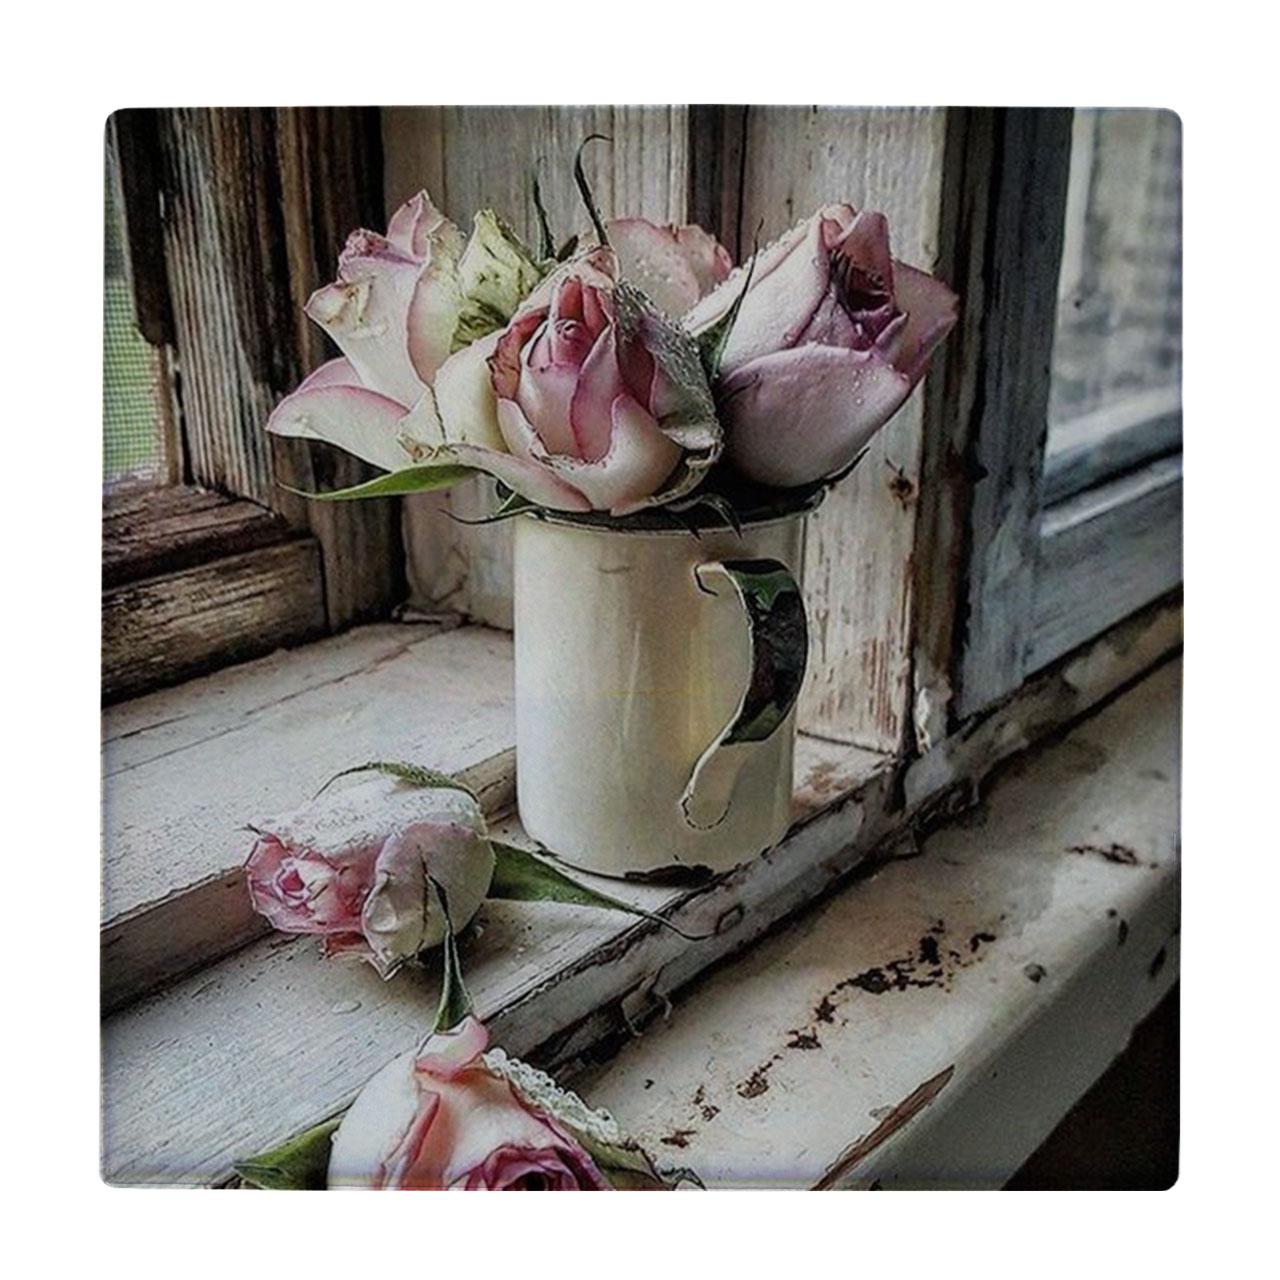 خرید                        کاشی طرح گلدان گل رز کد wk321